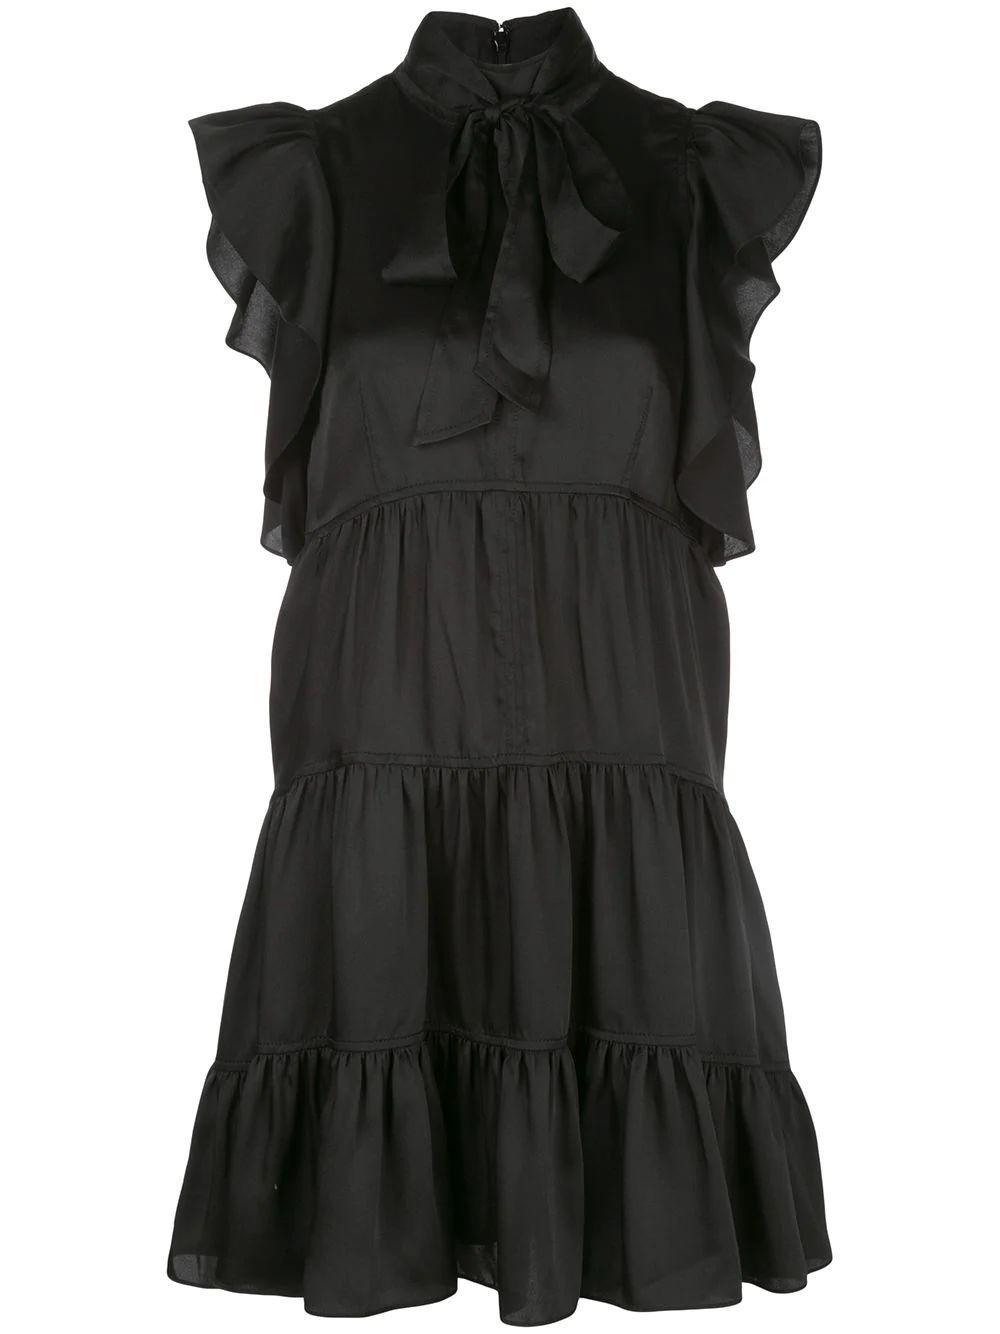 Rebecca Silk A-Line Tiered Dress